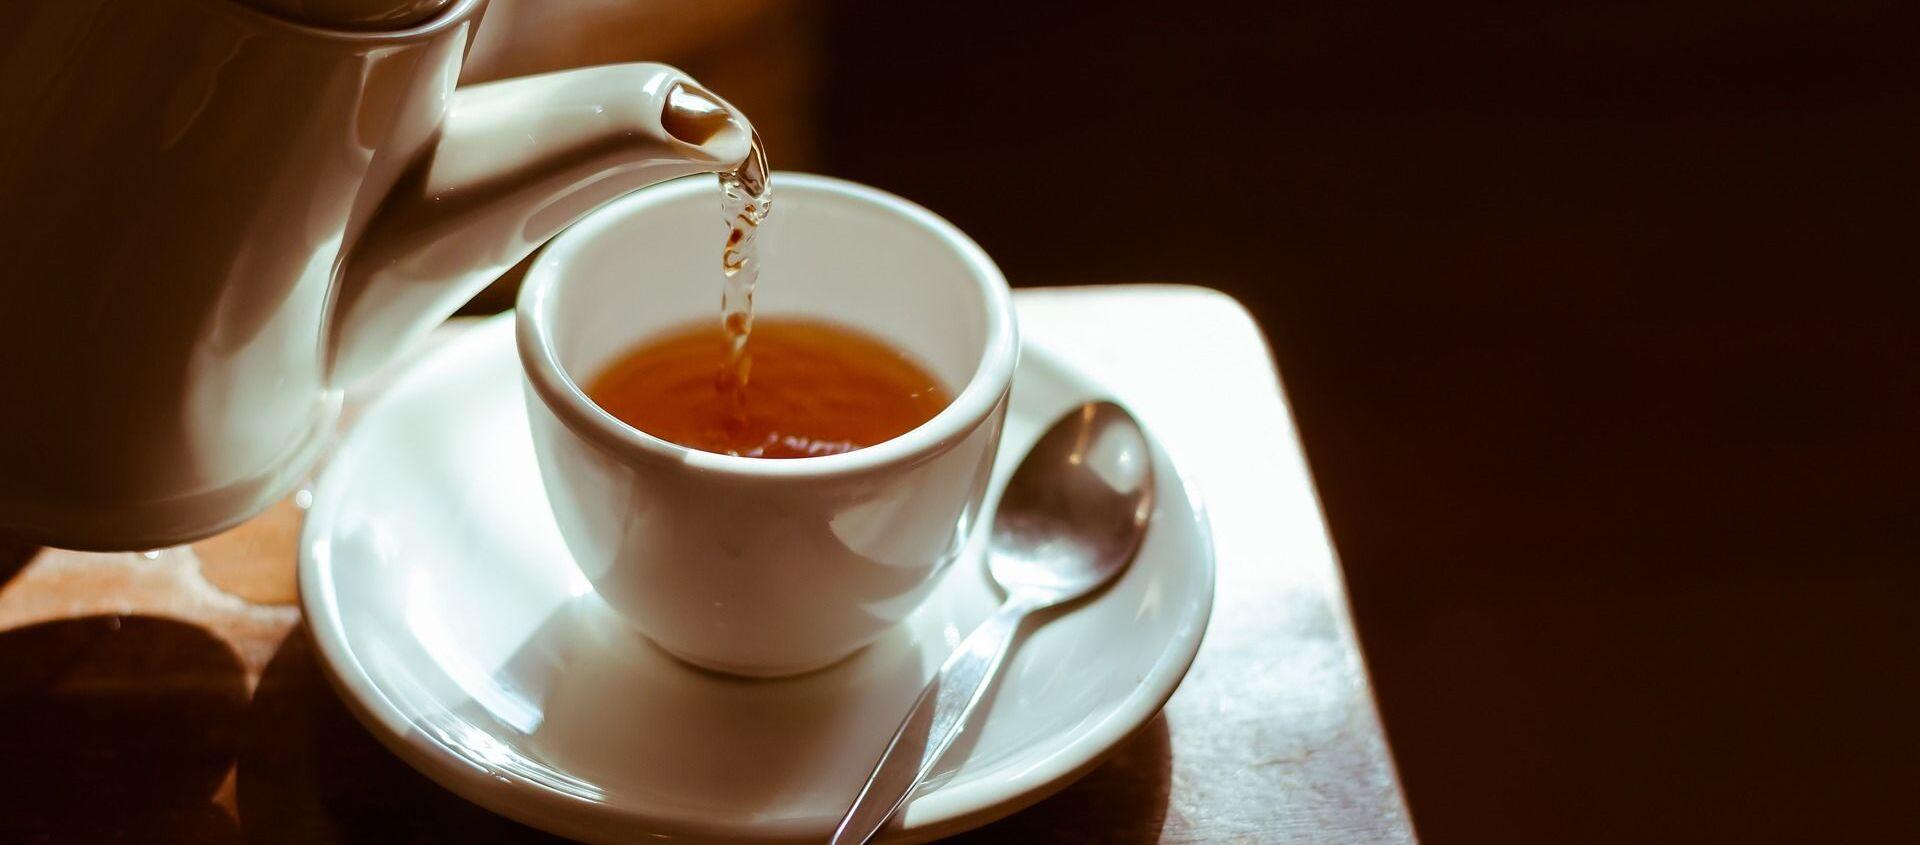 tazza di tè - Sputnik Italia, 1920, 09.09.2020